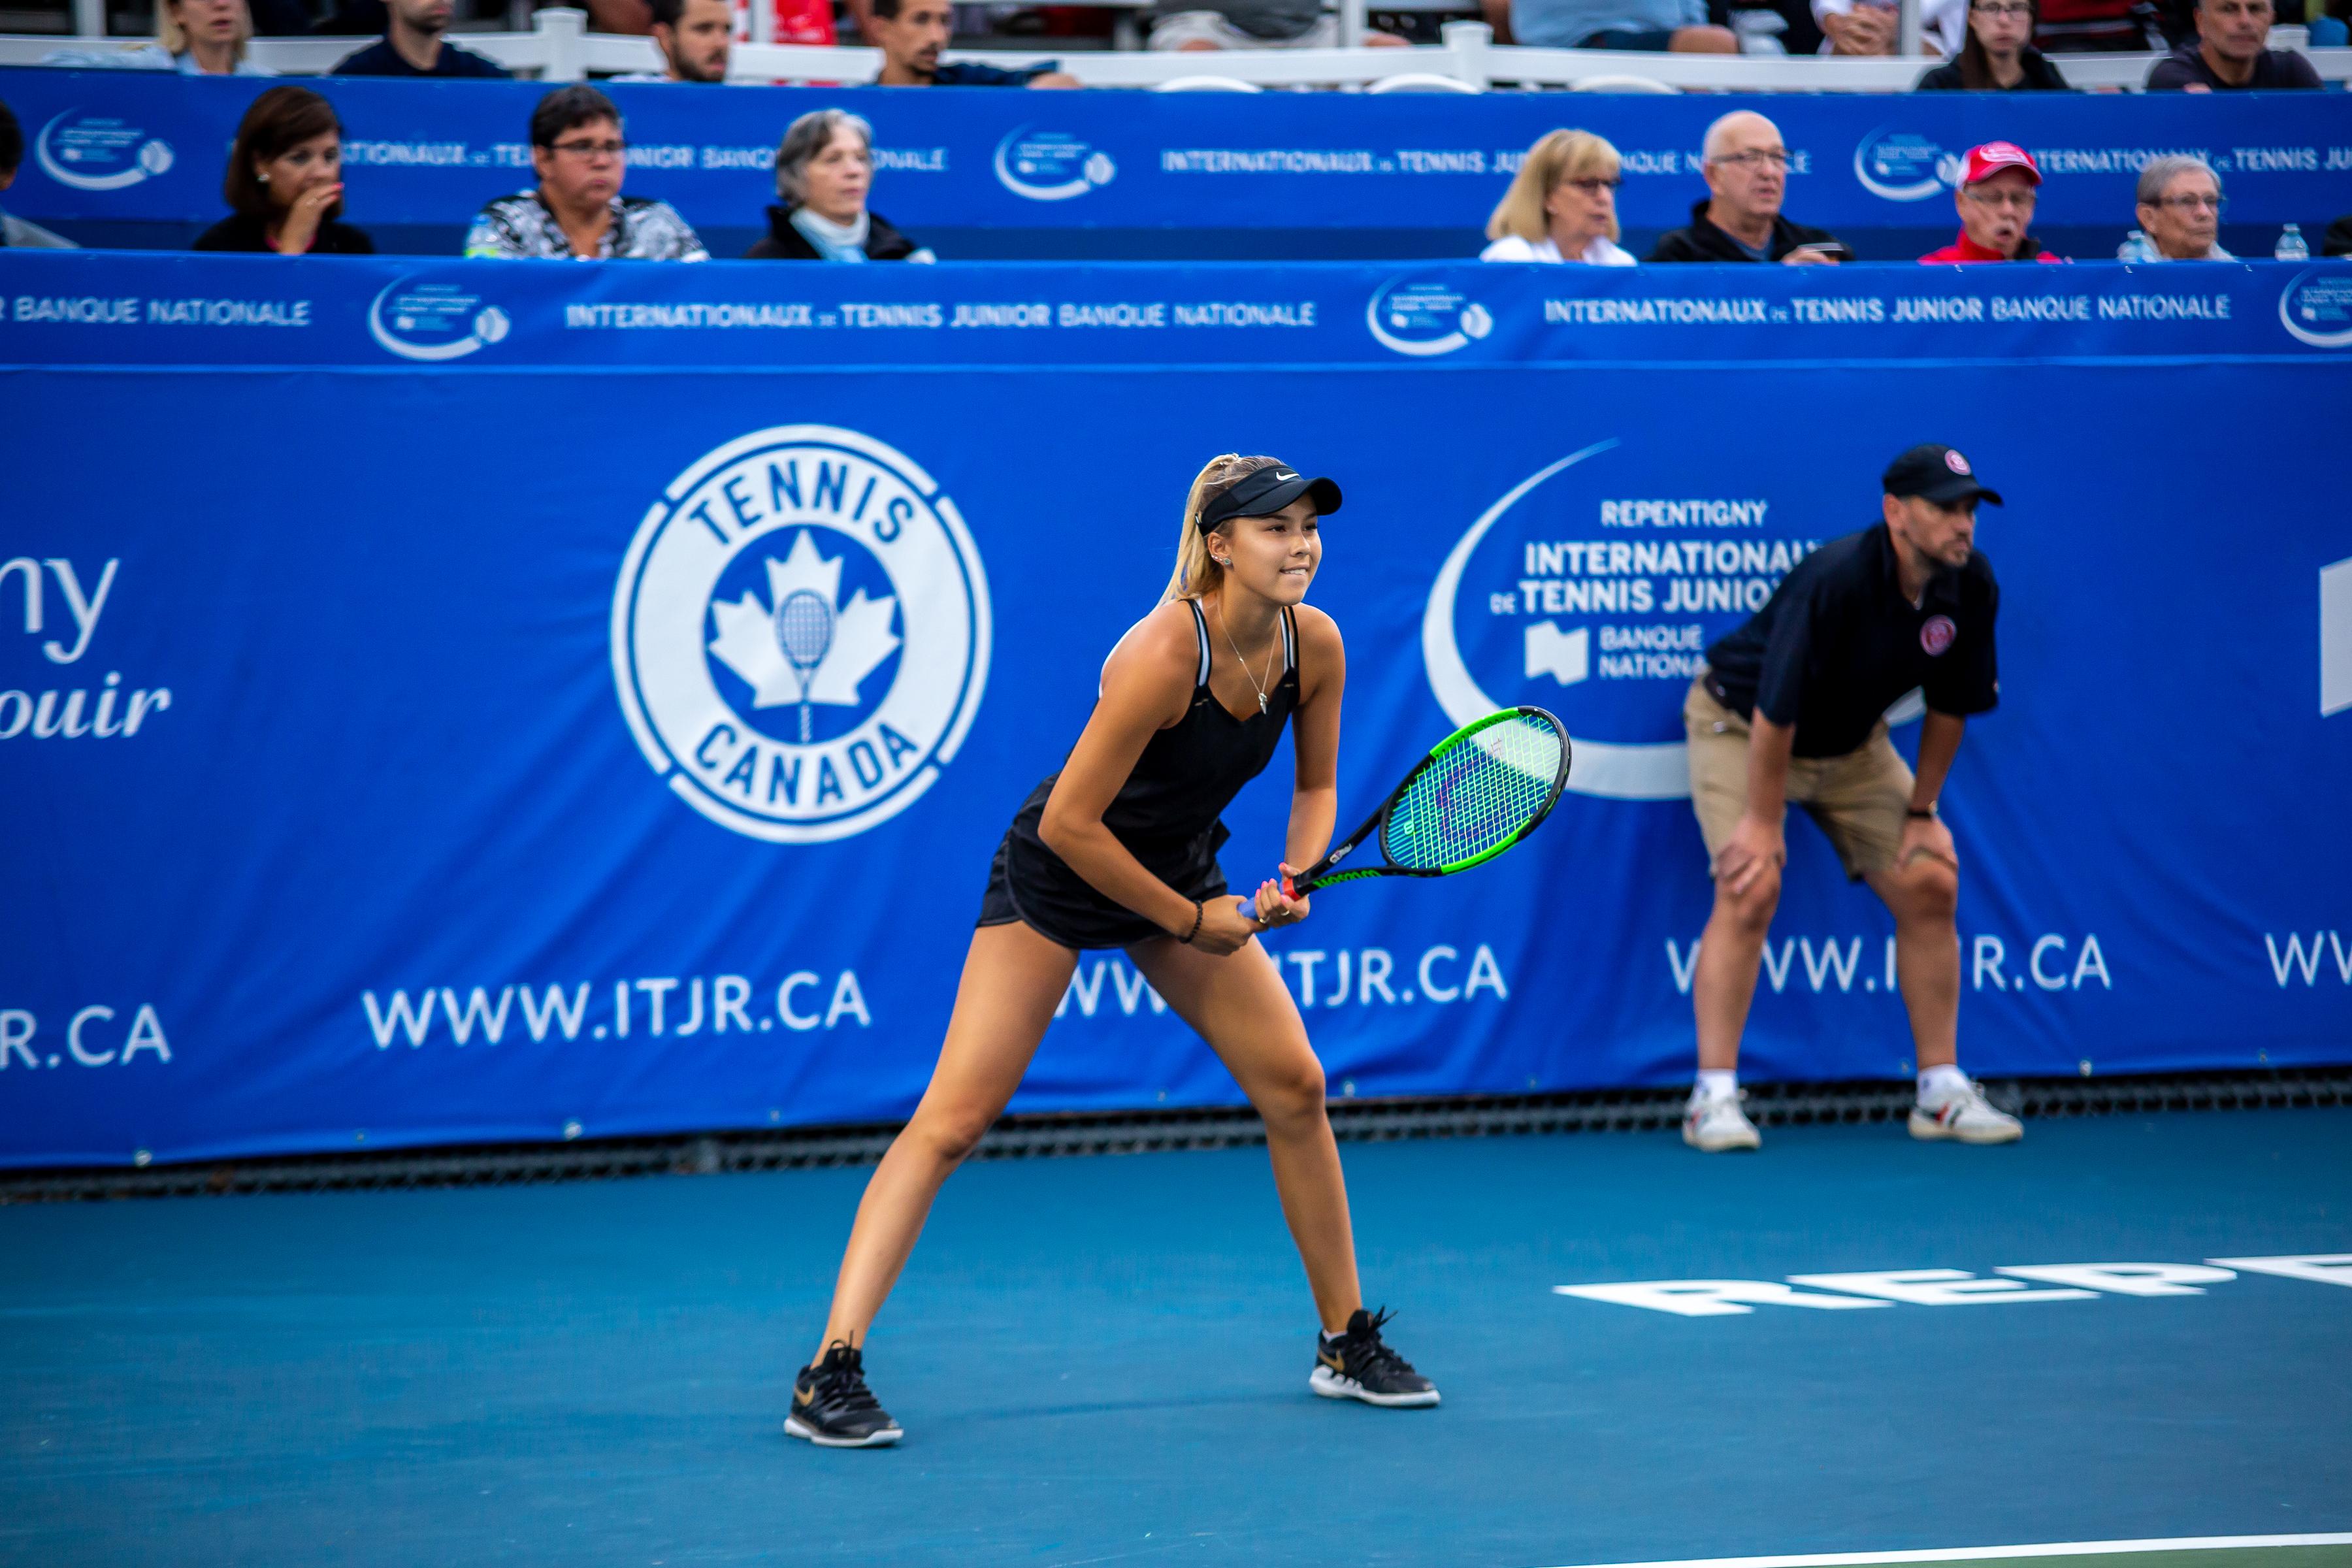 Tennis Repentigny